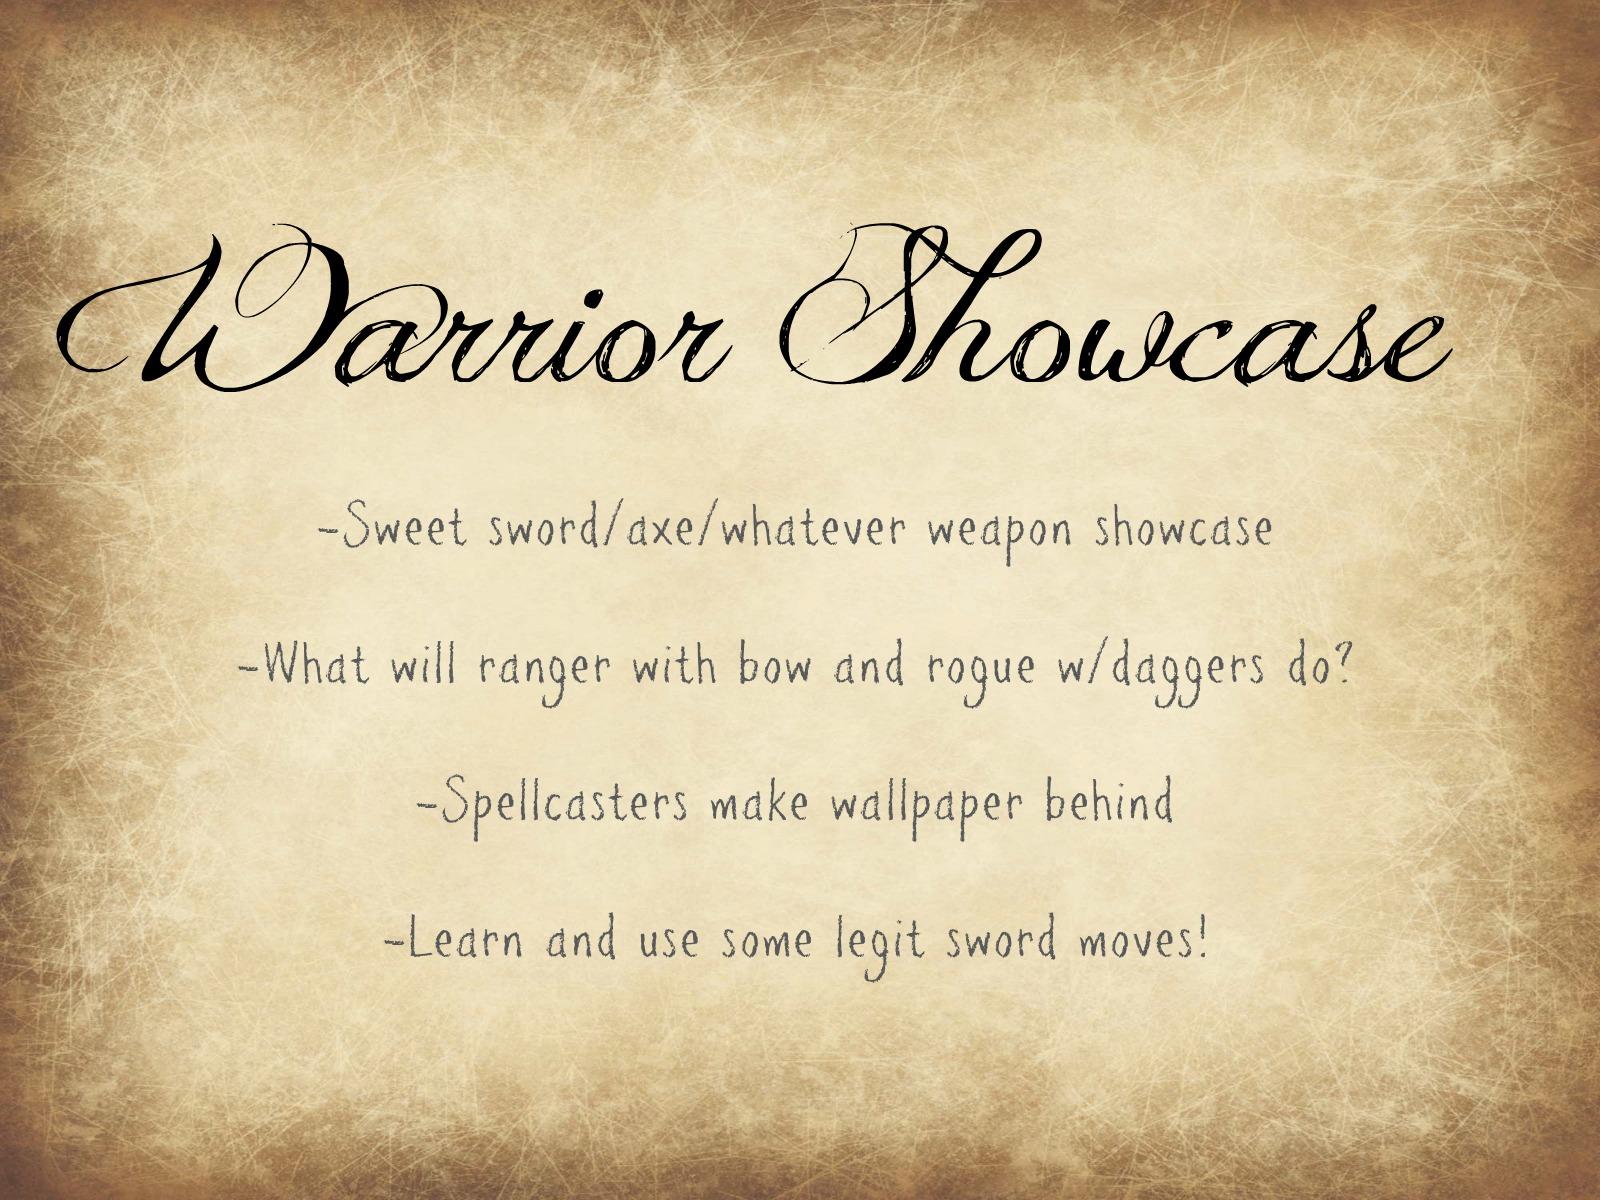 Warrior Showcase D&D.jpg